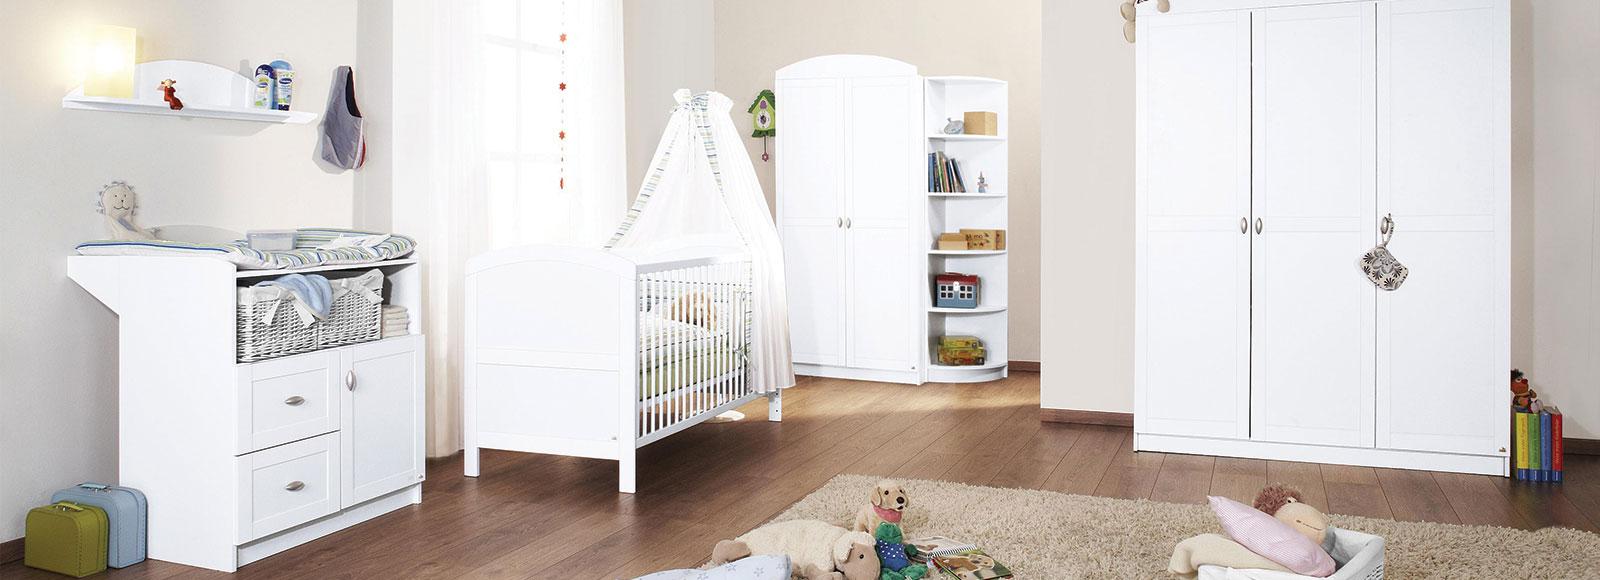 decoration-chambre-bebe